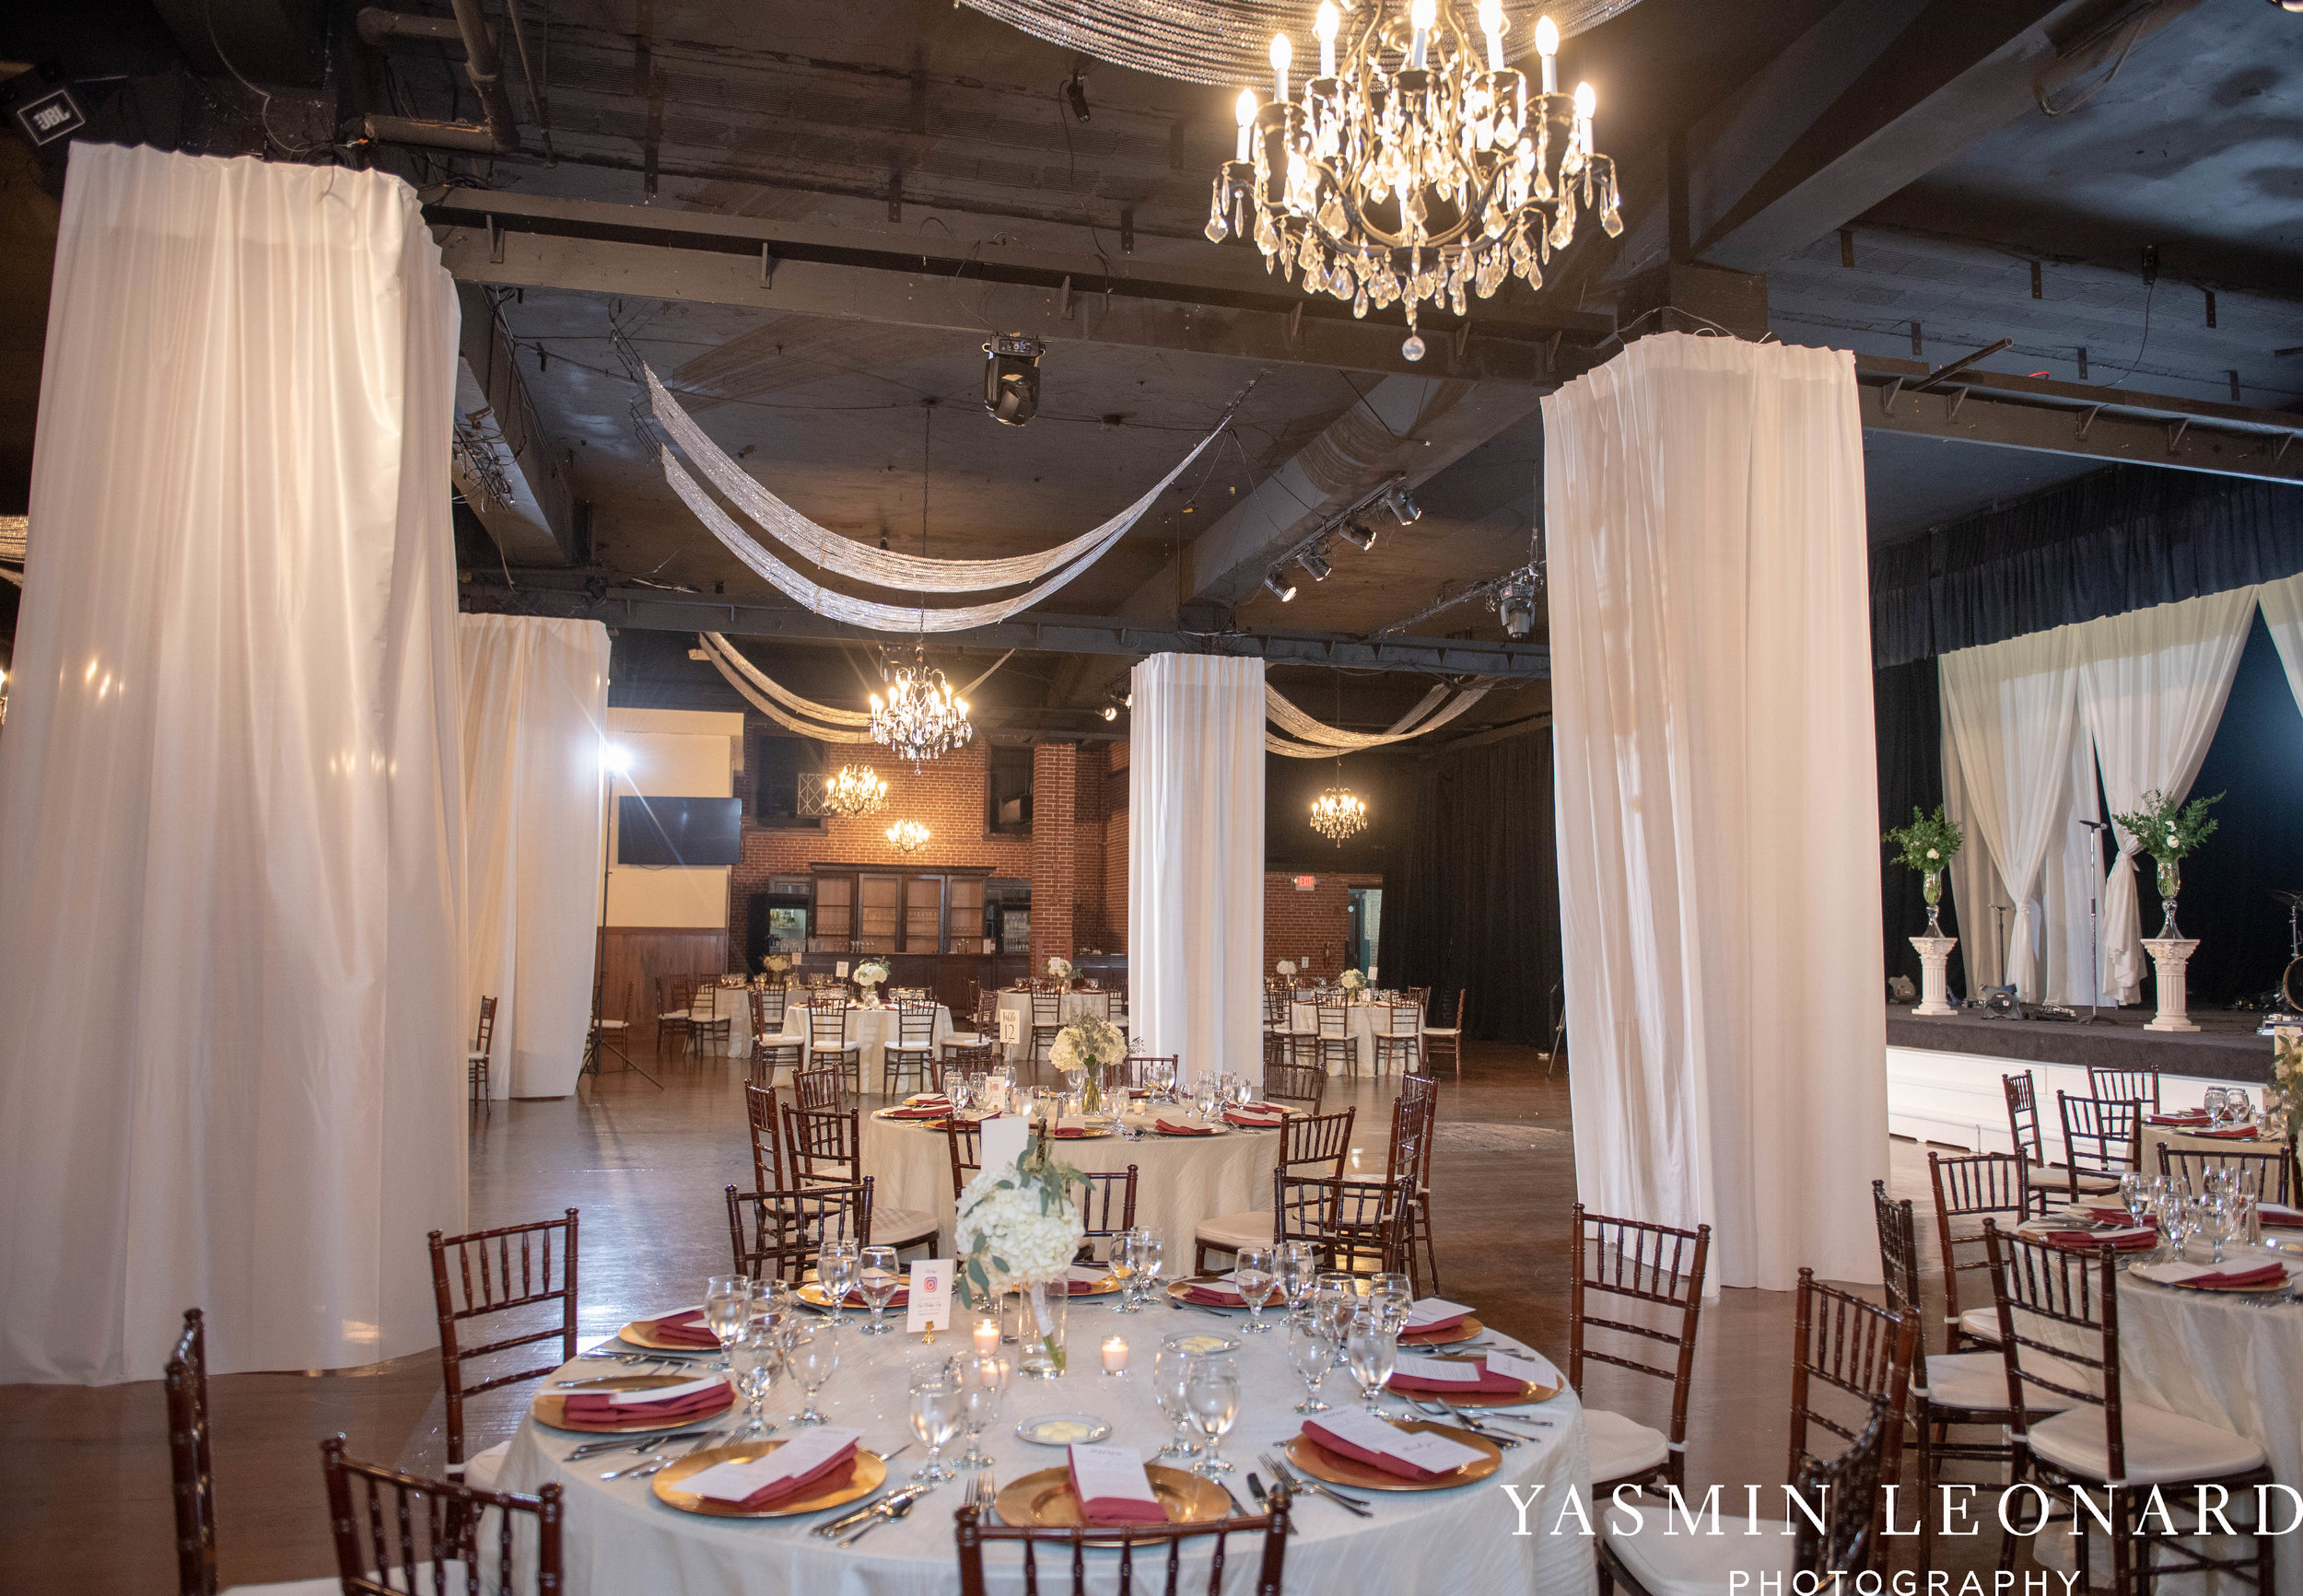 Millennium Center Wedding - Downtown Winston Salem - Winston Salem Wedding Photographer - Winston Salem Venues - Indoor Wedding Venues - NC Wedding Photographer - Yasmin Leonard Photography-62.jpg